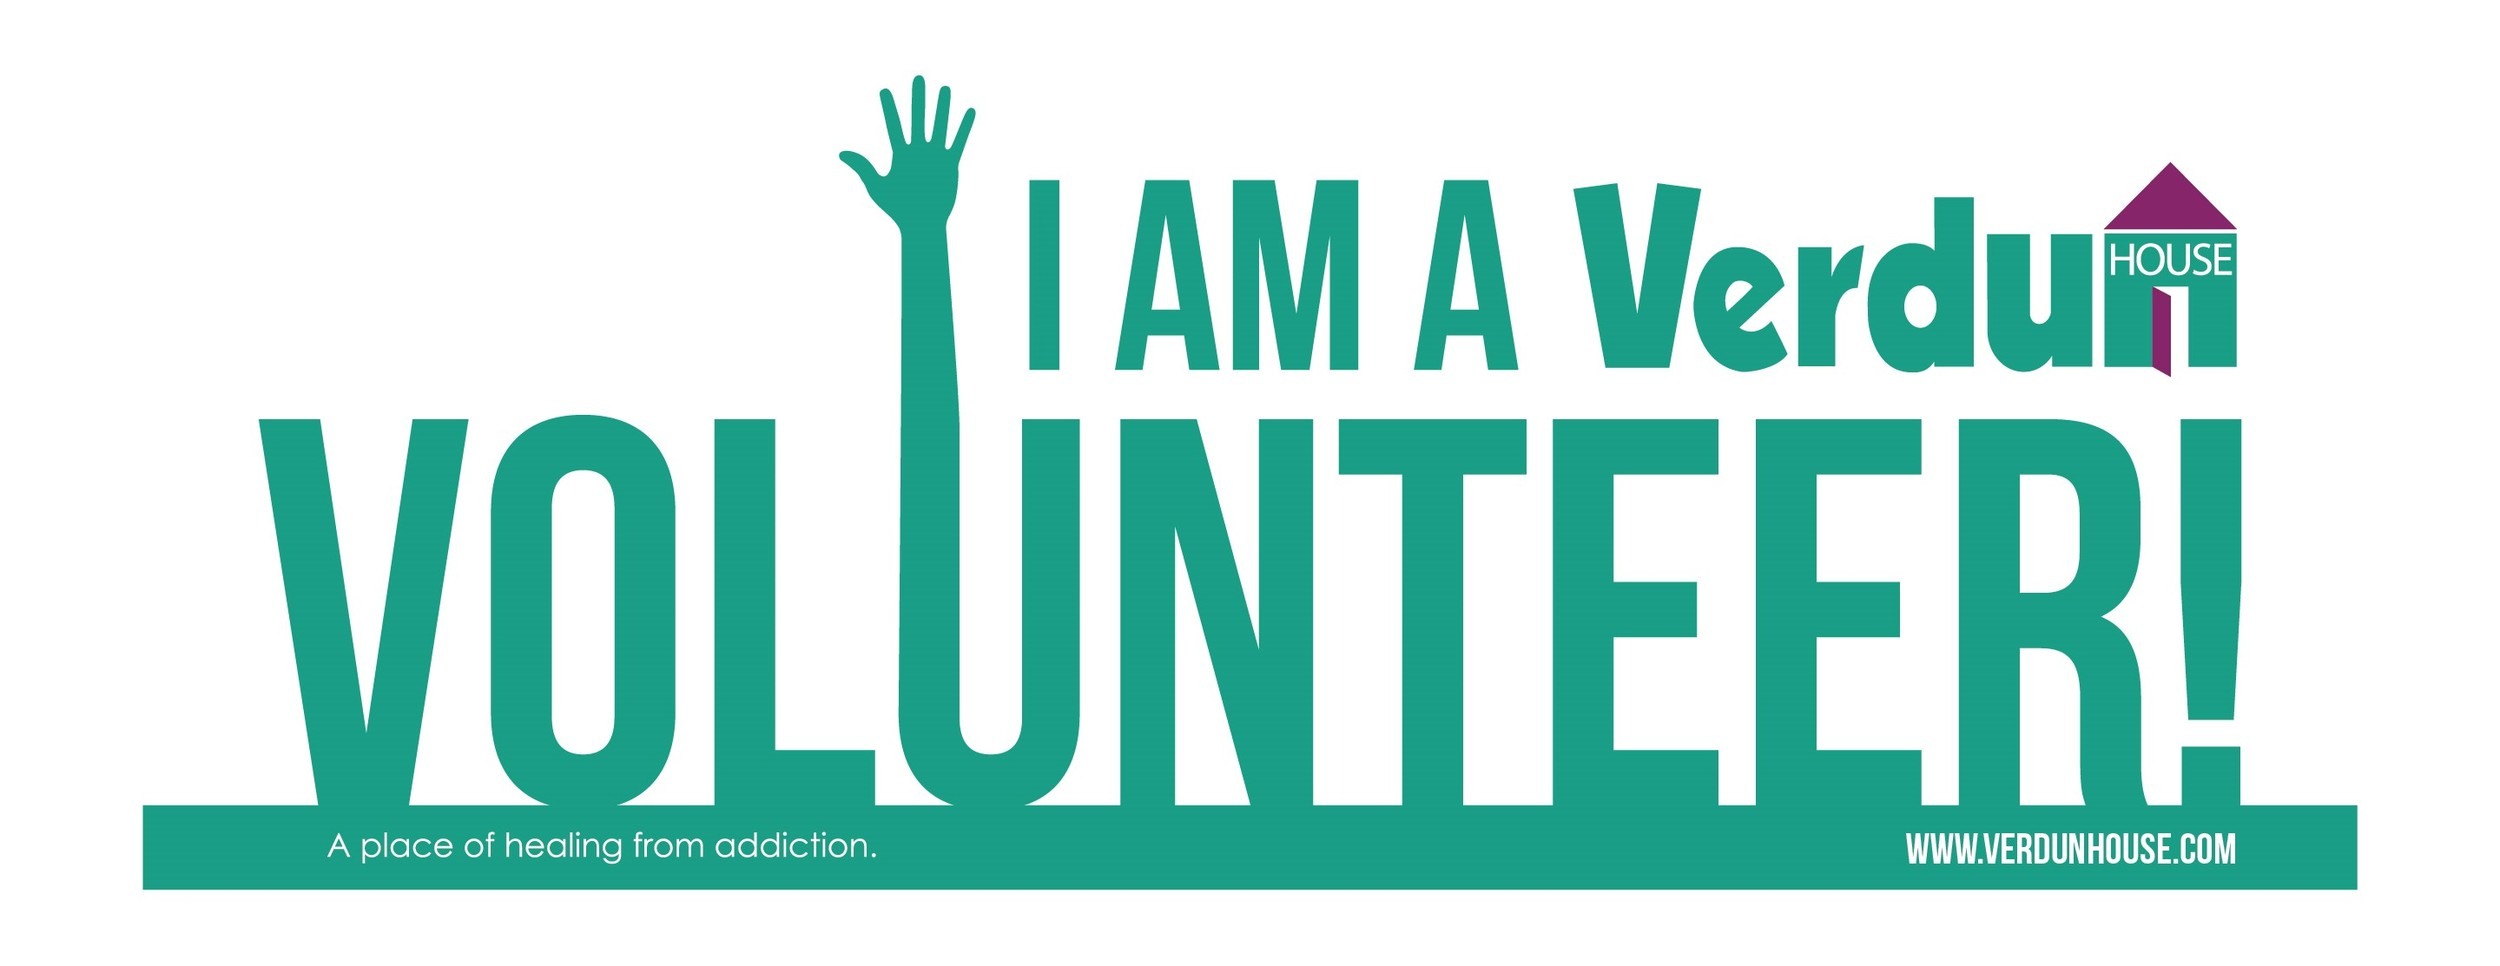 I am a Verdun Volunteer.jpg